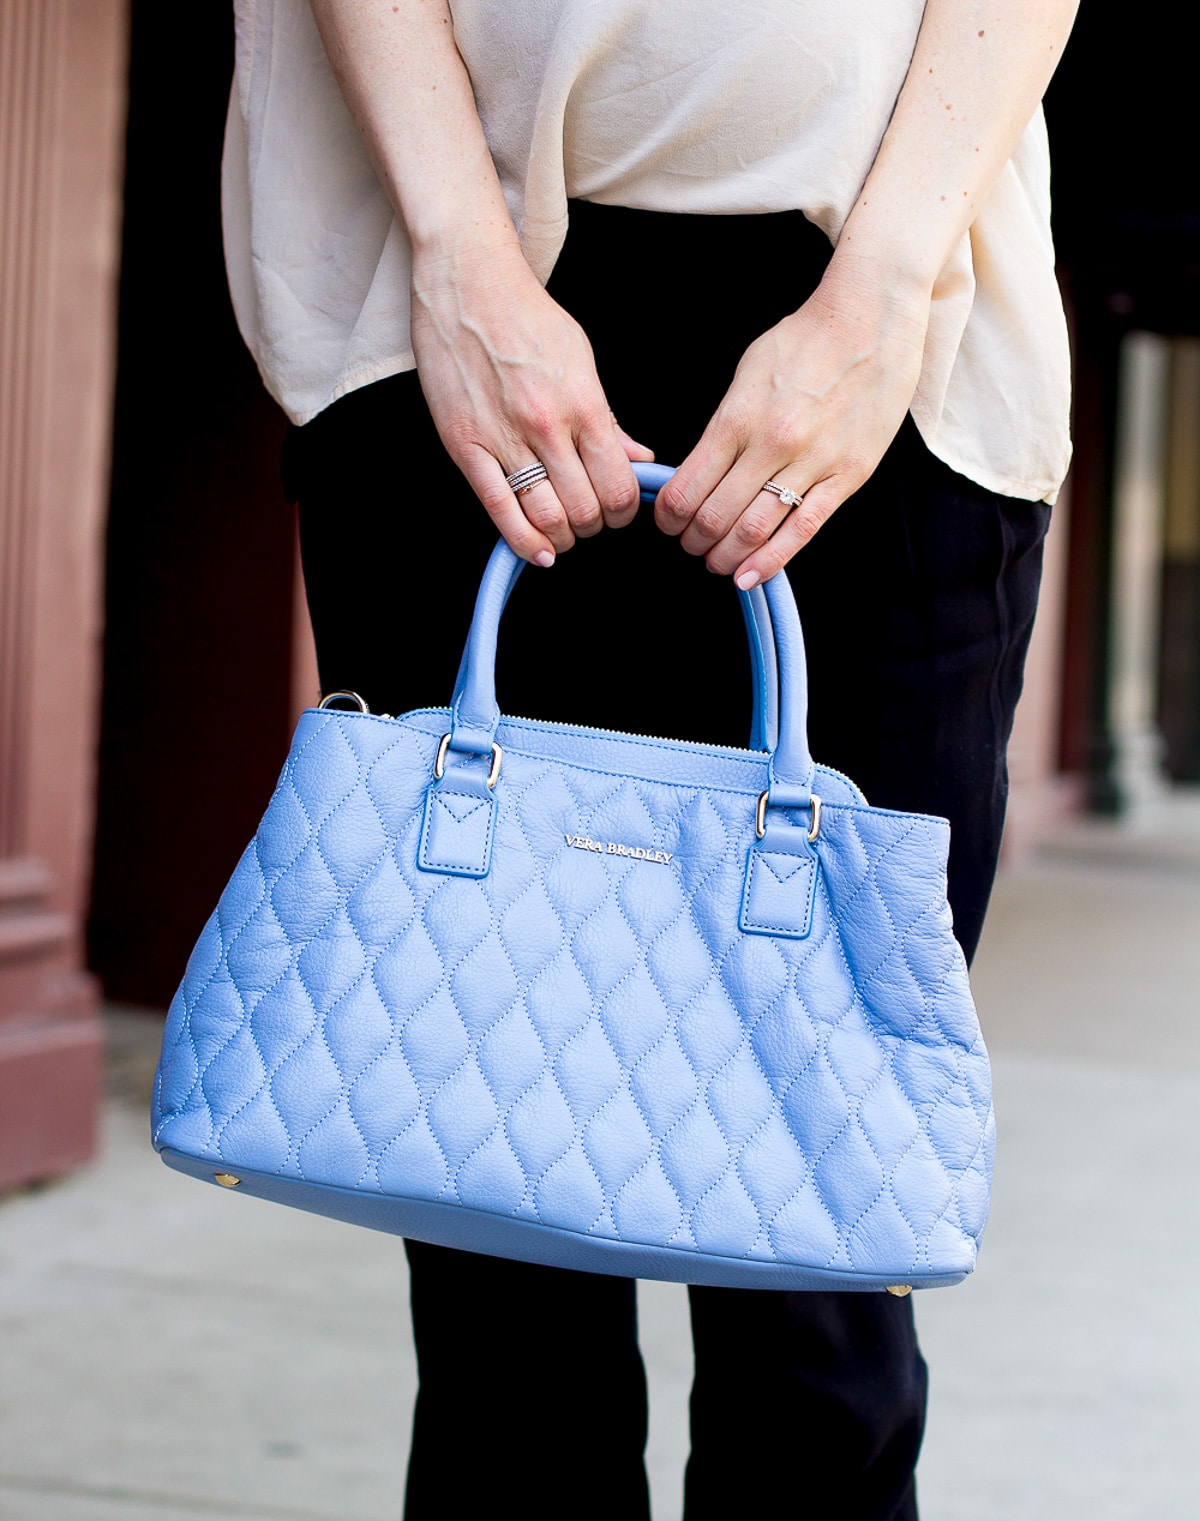 Vera Bradley Purse_Top US Fashion Blogger_How to style a blue purse-4